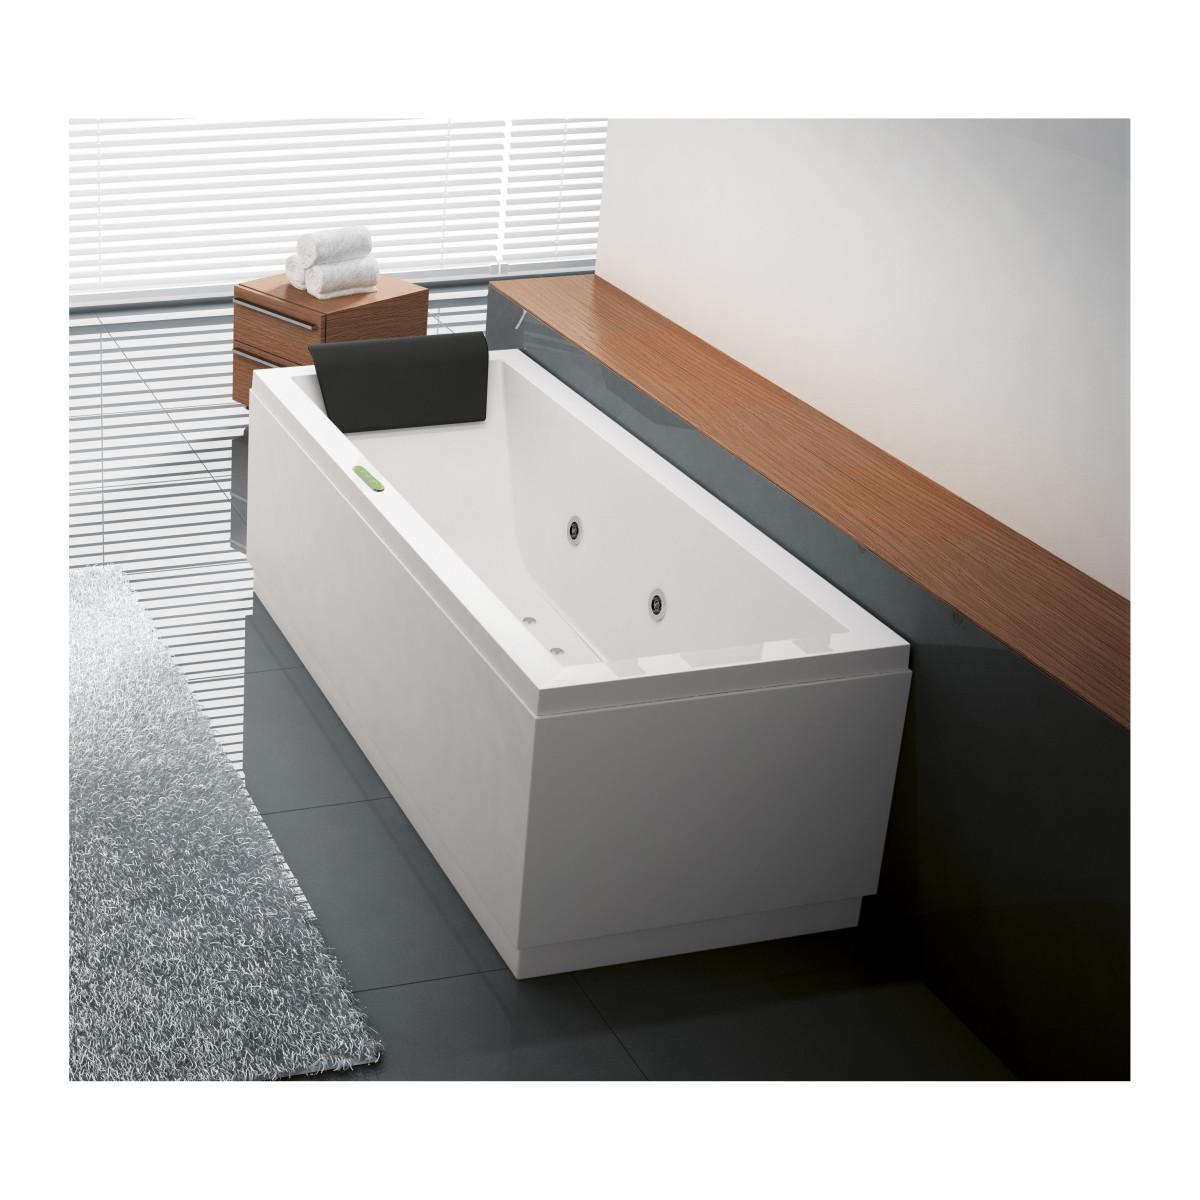 Vasca idromassaggio amea 180 x 80 cm prezzi e offerte online for Sdraio leroy merlin prezzi